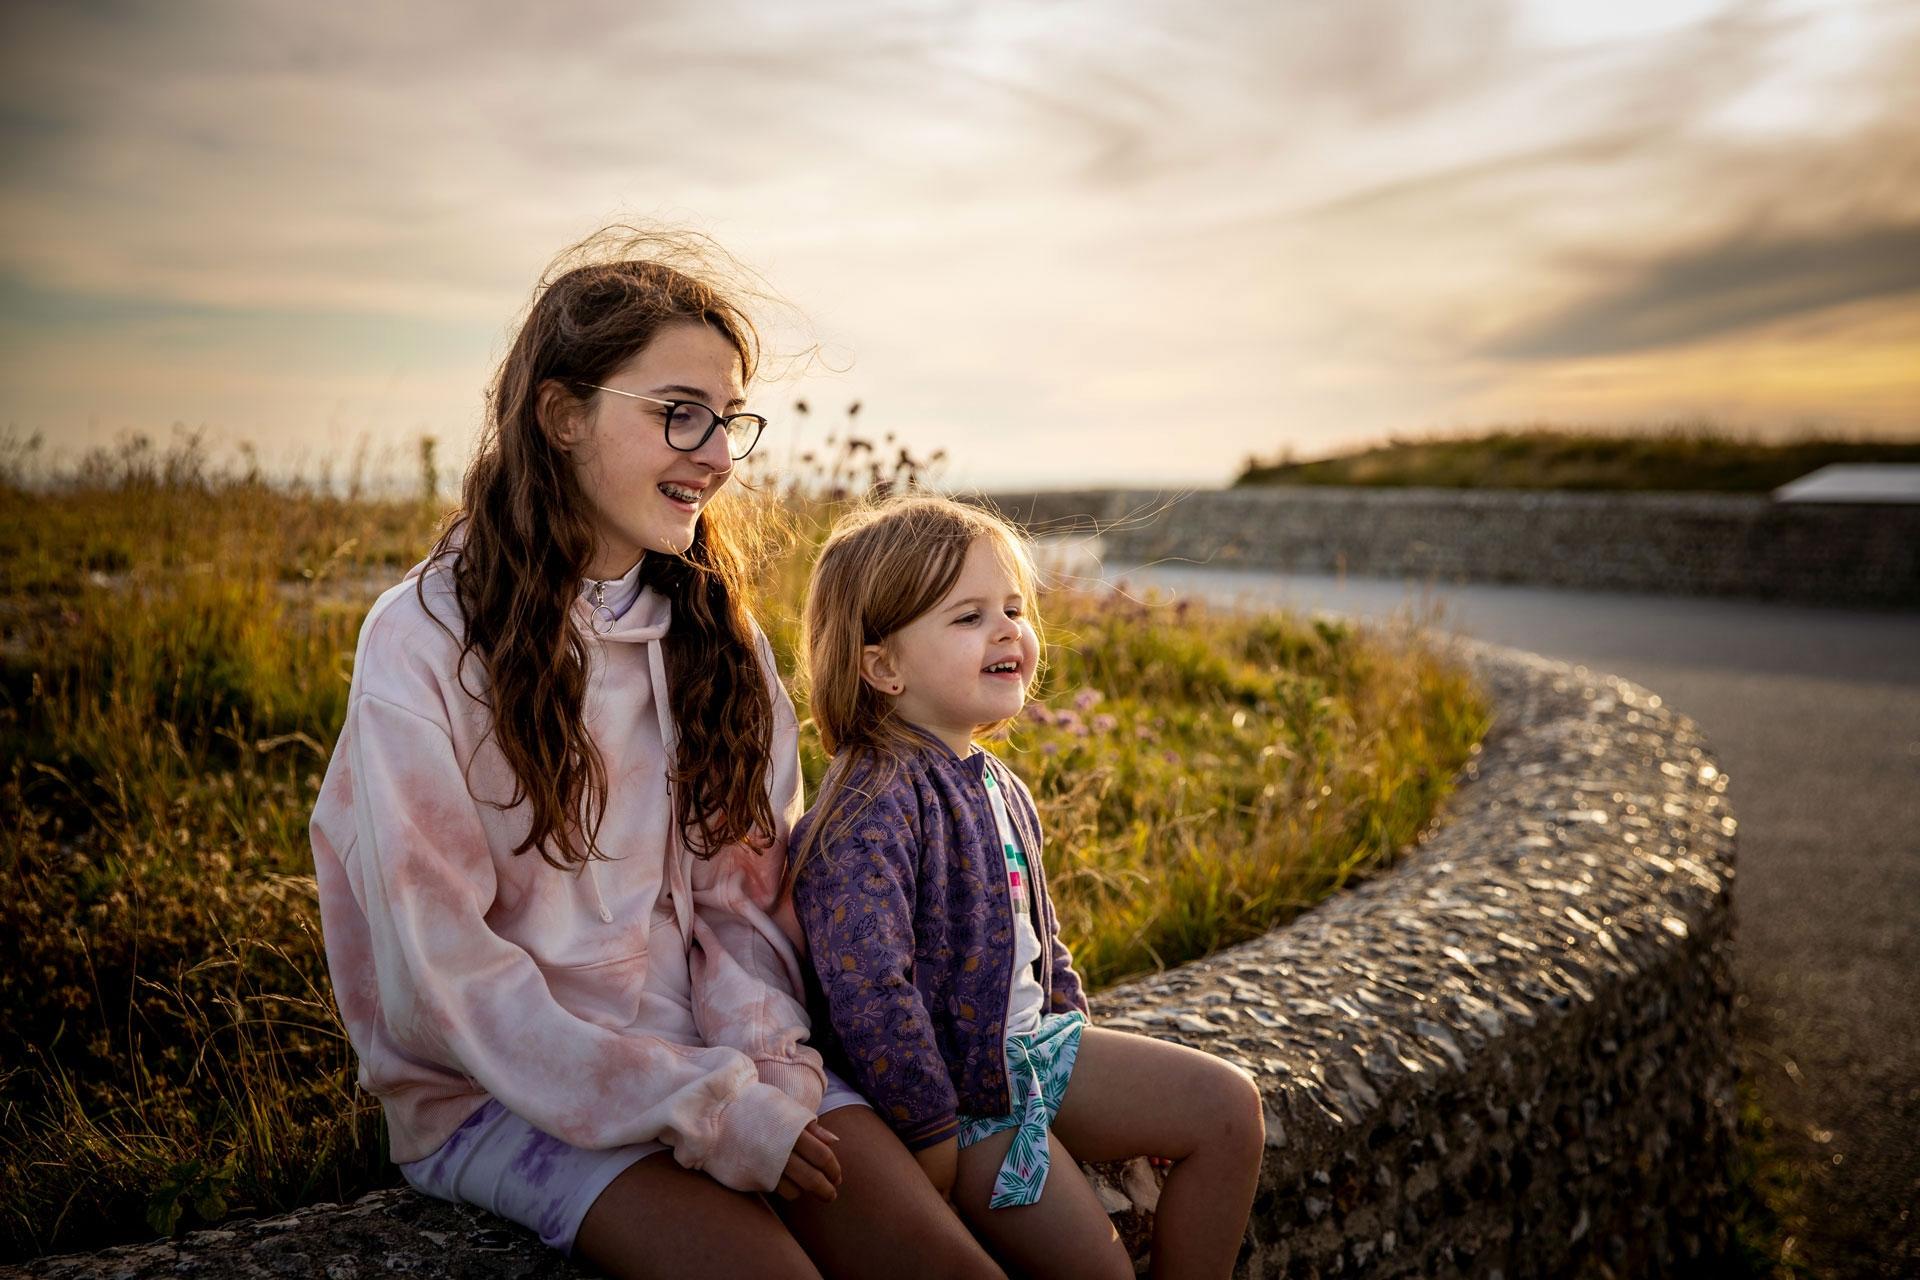 particuliers-portraits-famille-chauveau-mary-2020-033